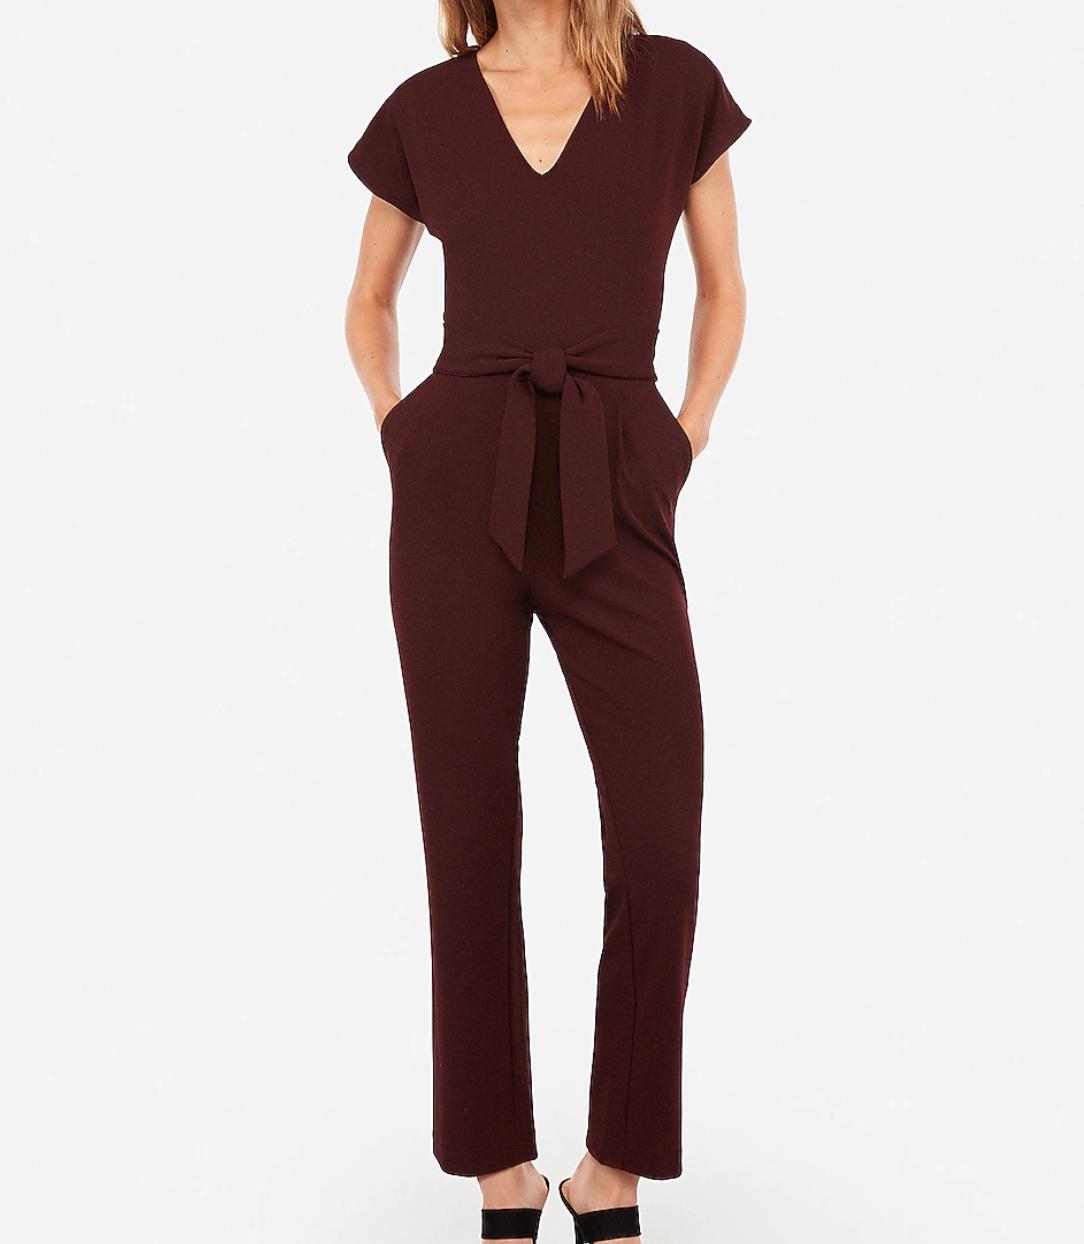 V-neck tie waist jumpsuit